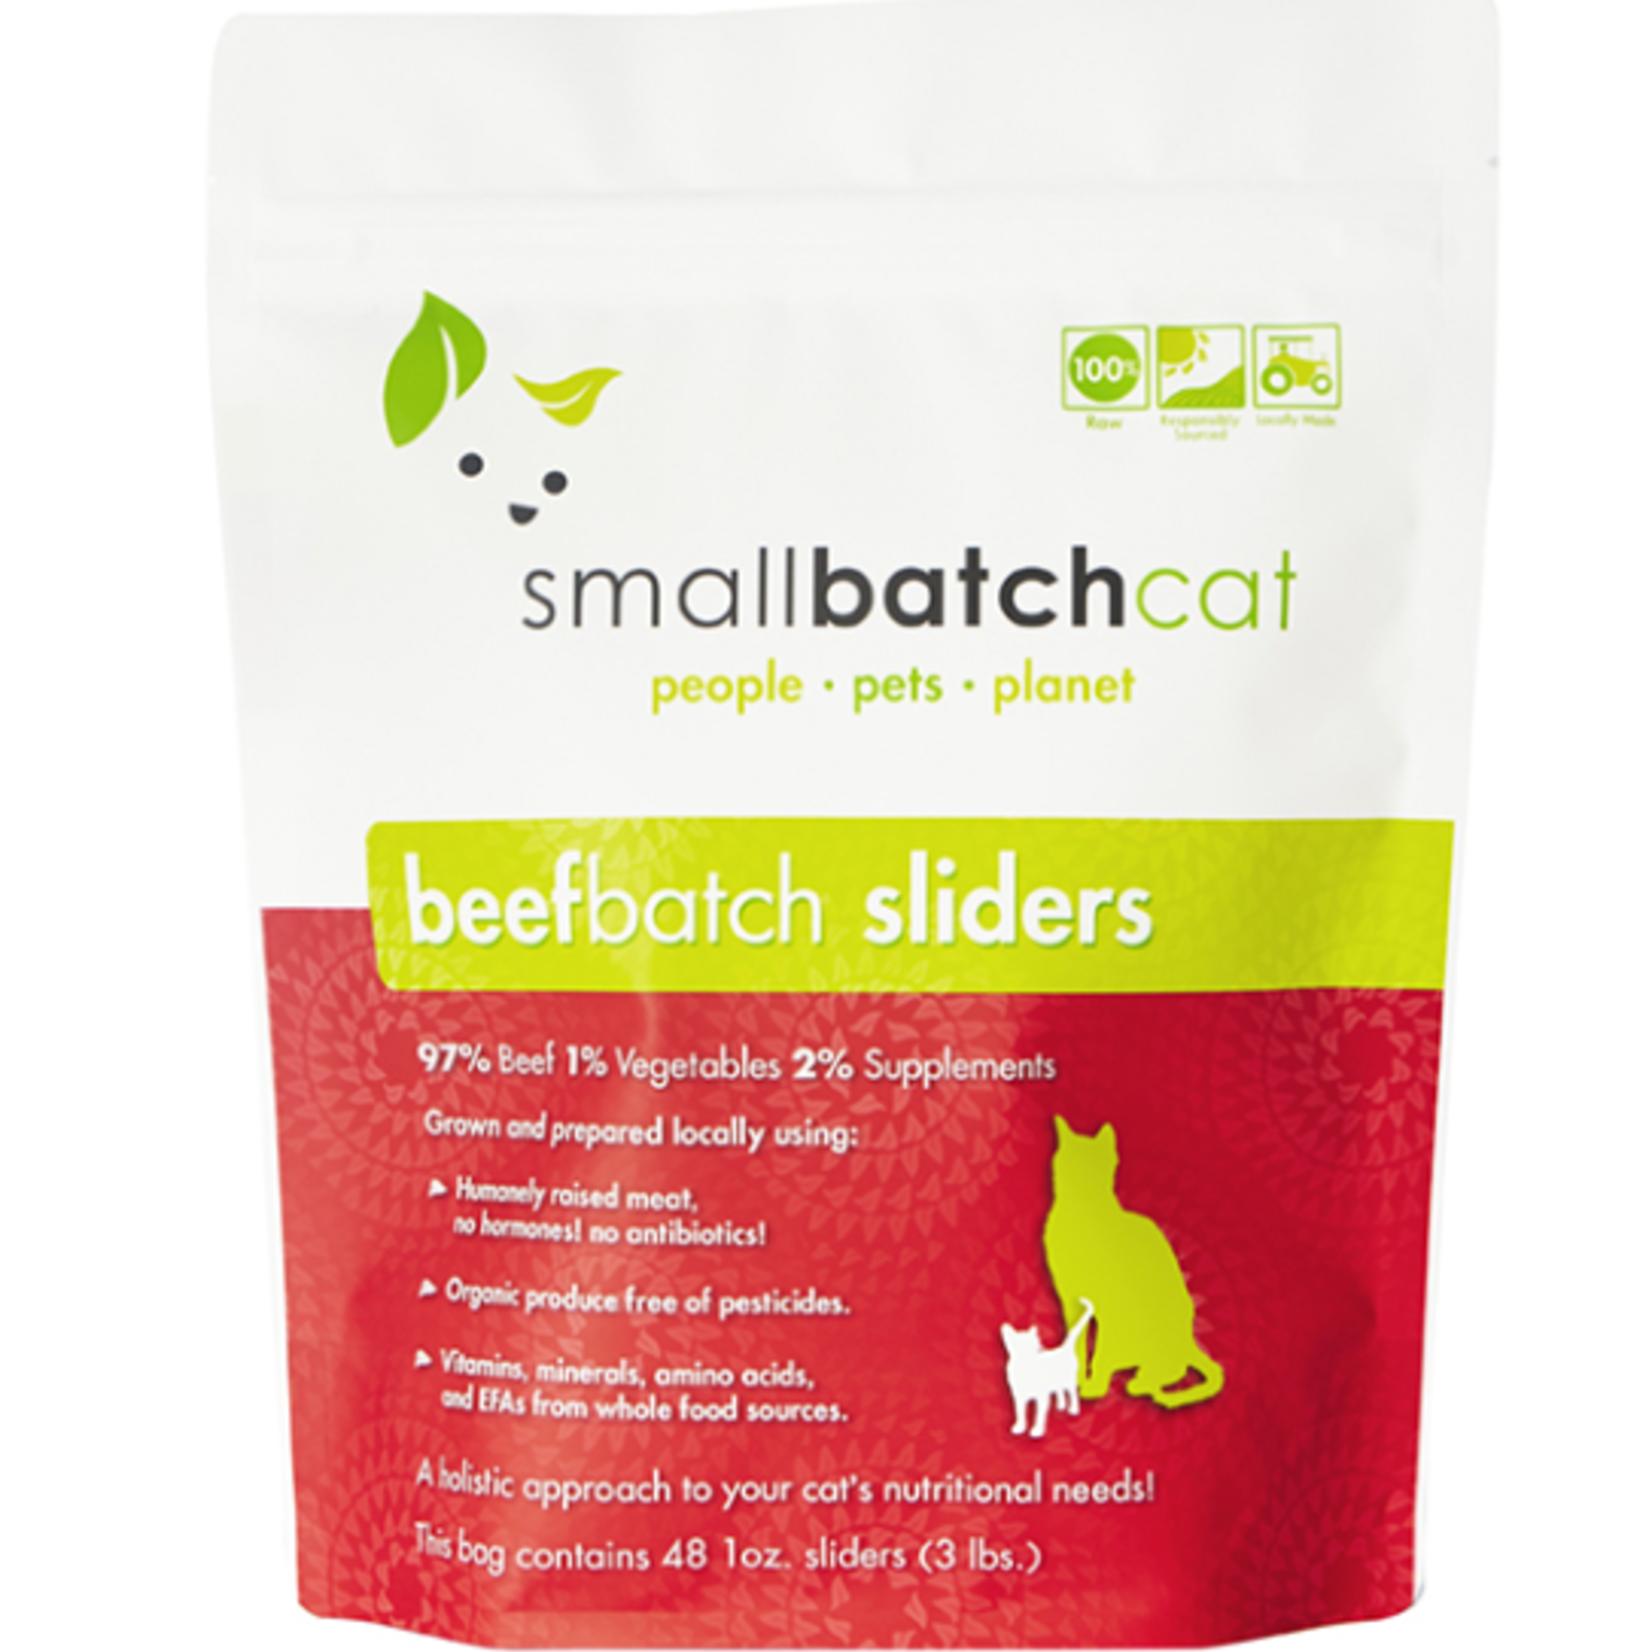 Small Batch Small Batch Cat Frozen Beef Sliders 3#